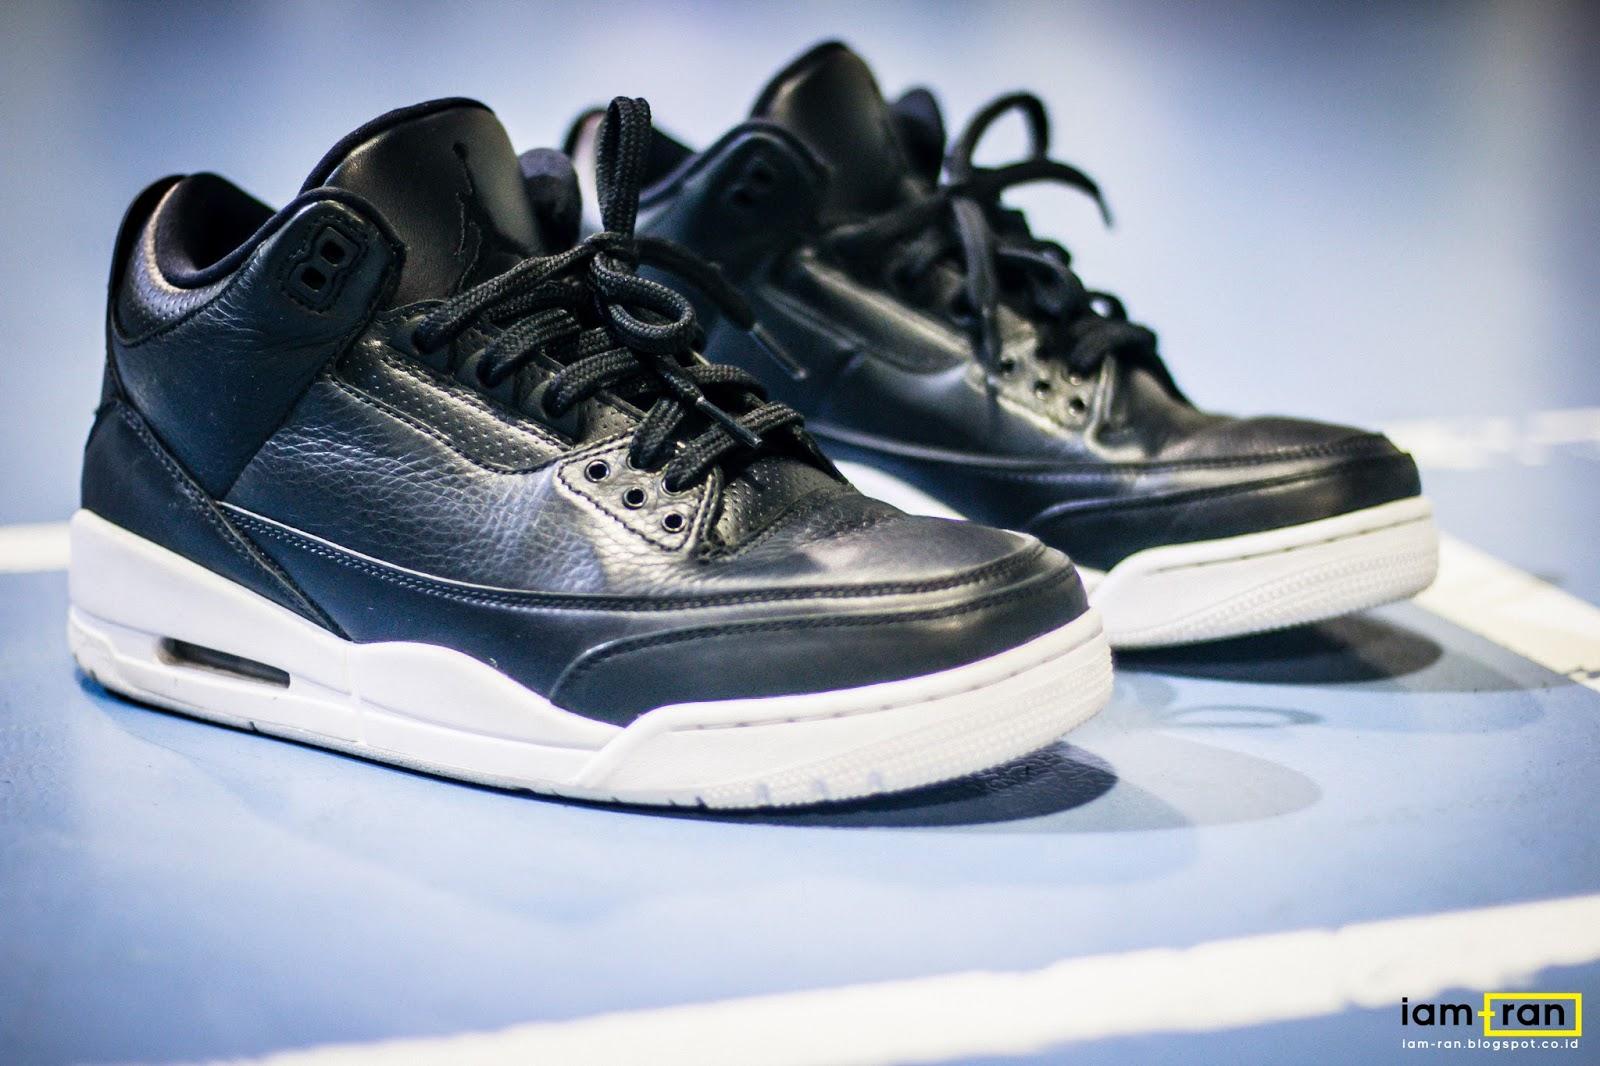 bb80612e0f9d IAM-RAN  Leo - Nike Air Jordan 3